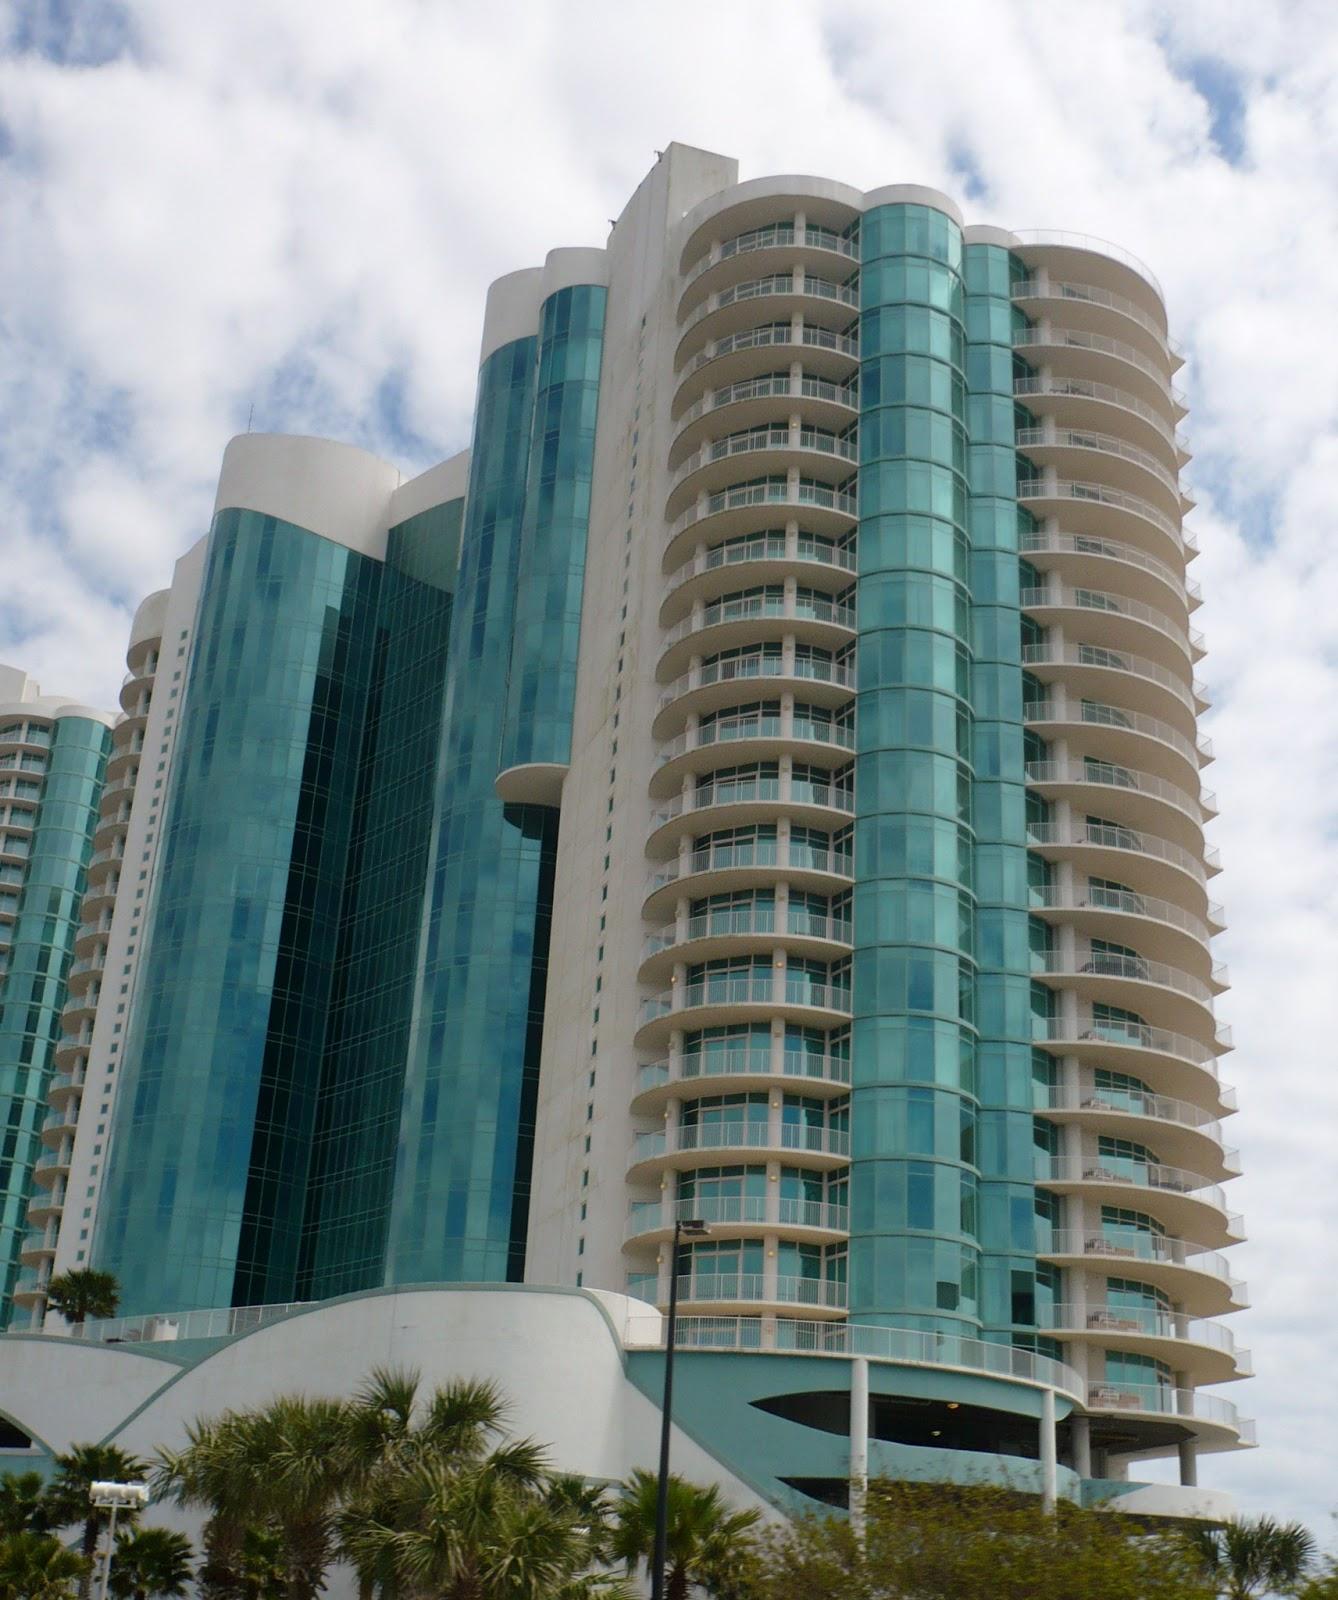 Perdido Key Rv Resort: Free Rosey & Free Willy RV Travel: Gulf Shores, Alabama